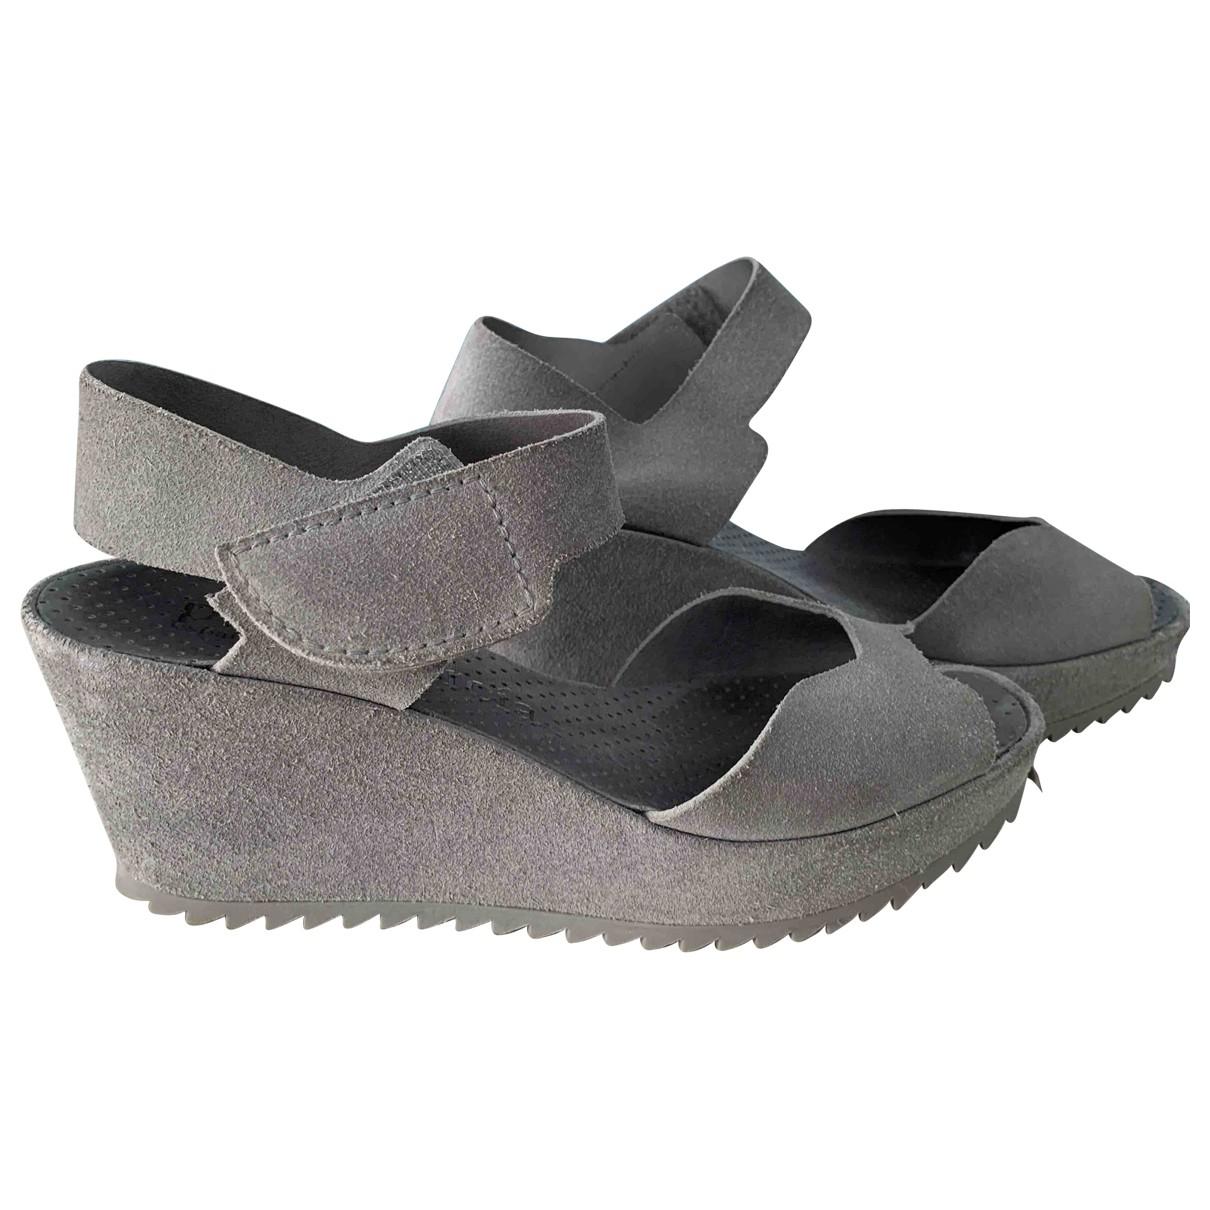 Pedro Garcia \N Grey Suede Sandals for Women 38 EU